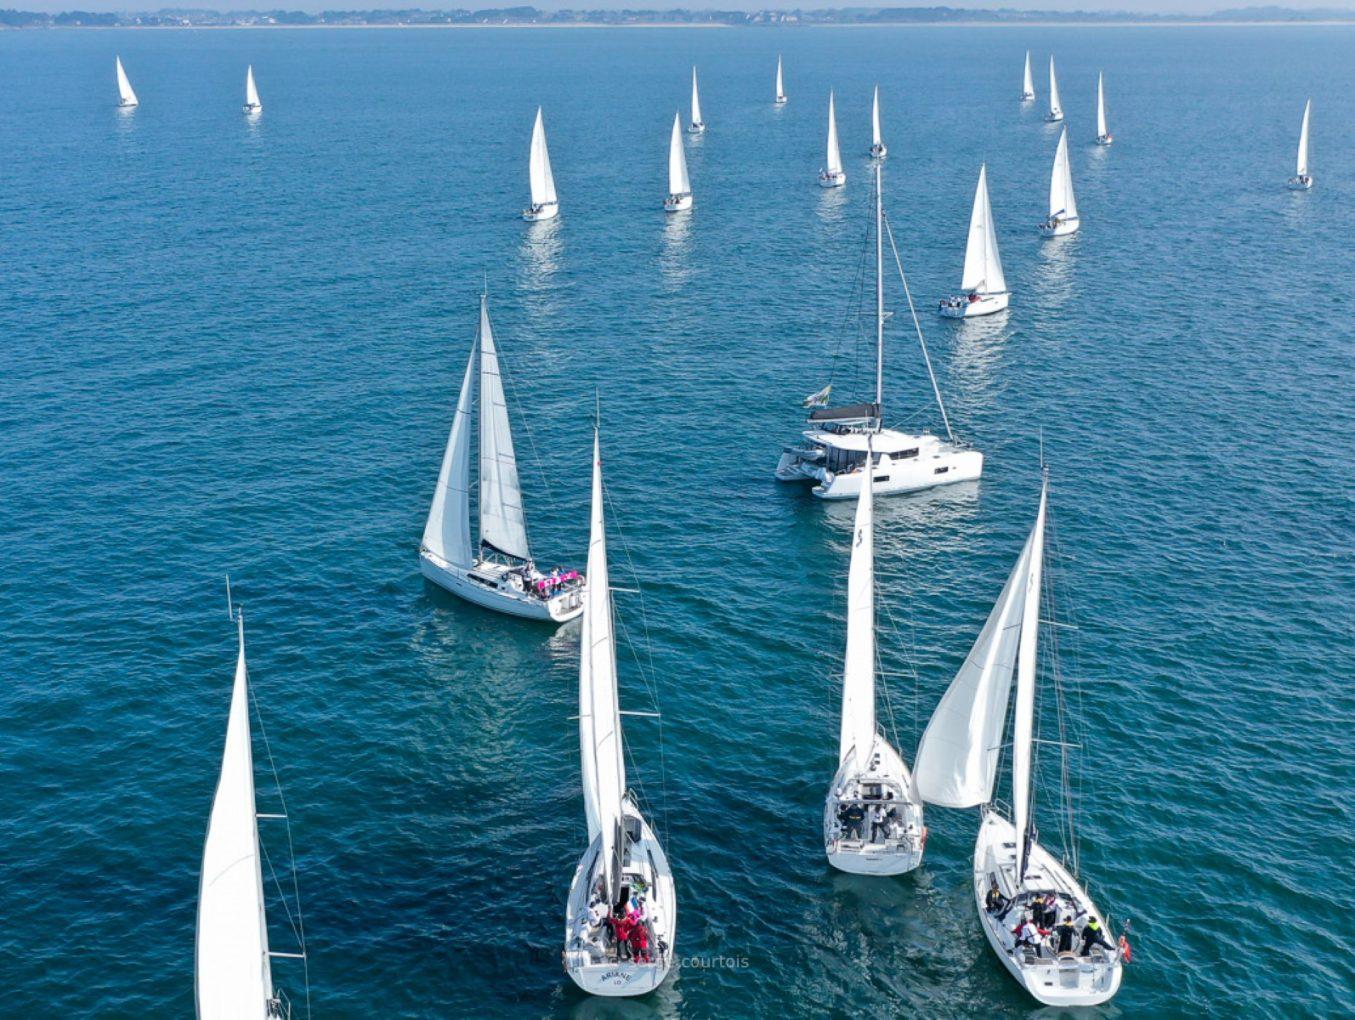 Regatta.lu Sailing Schools 2019 -  LGL gagne avec un double podium